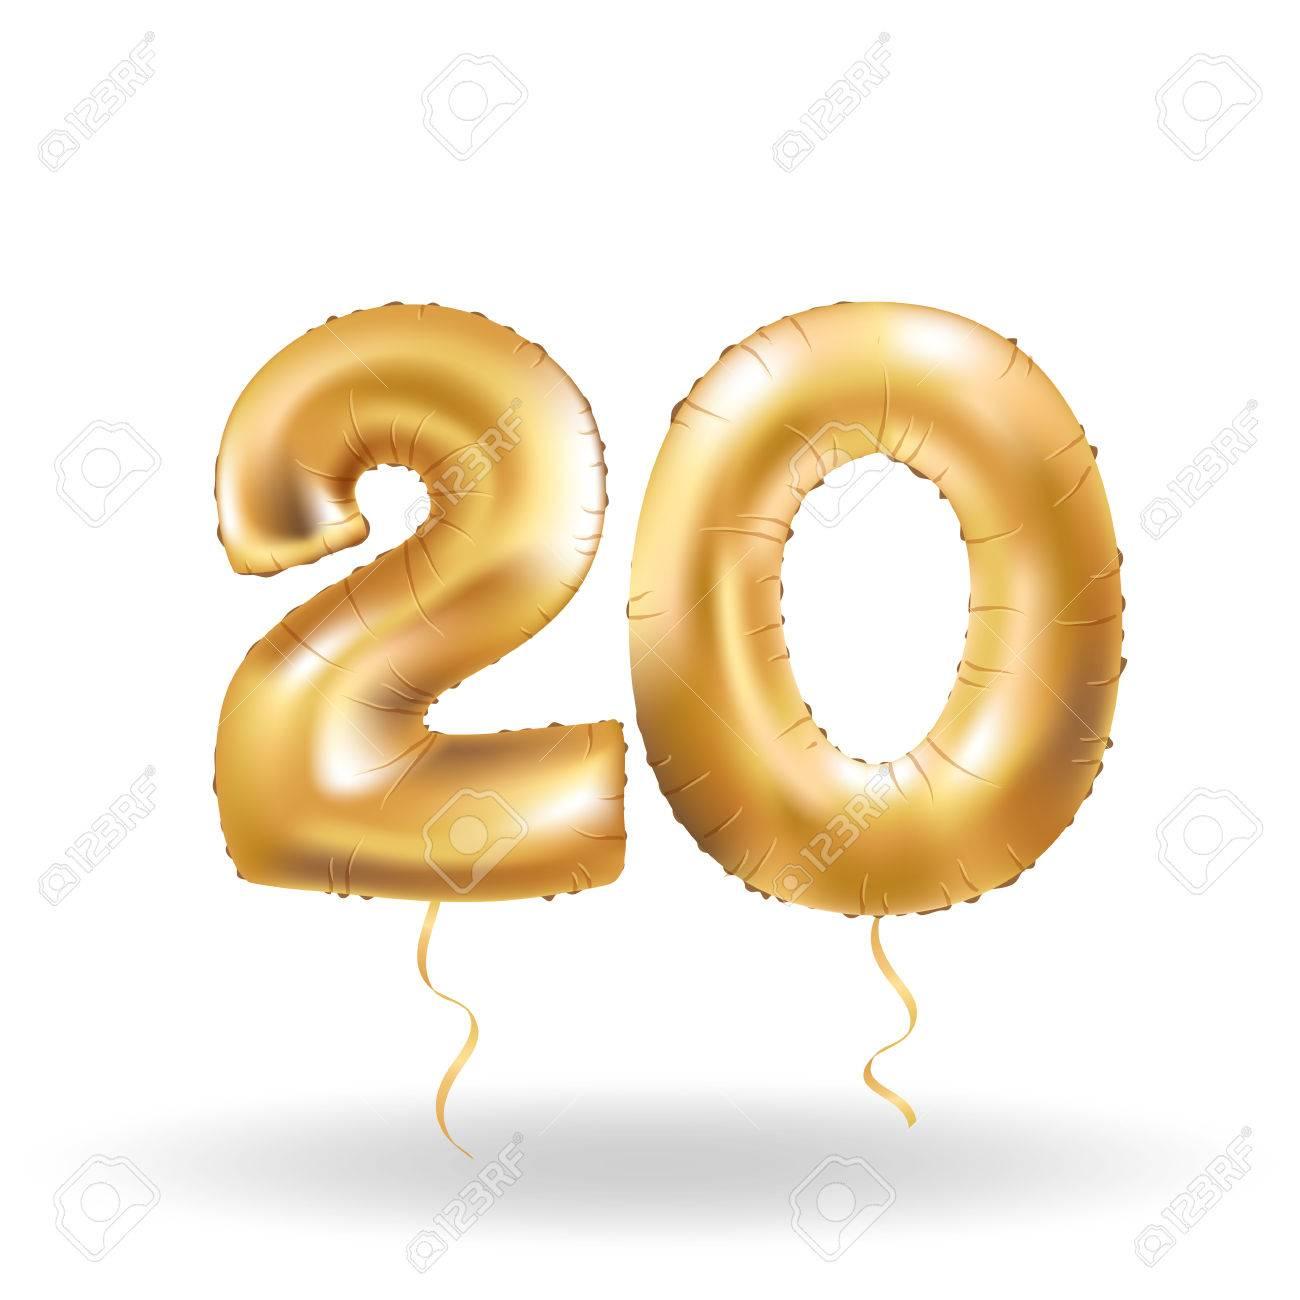 number twenty metallic balloon - 79160224